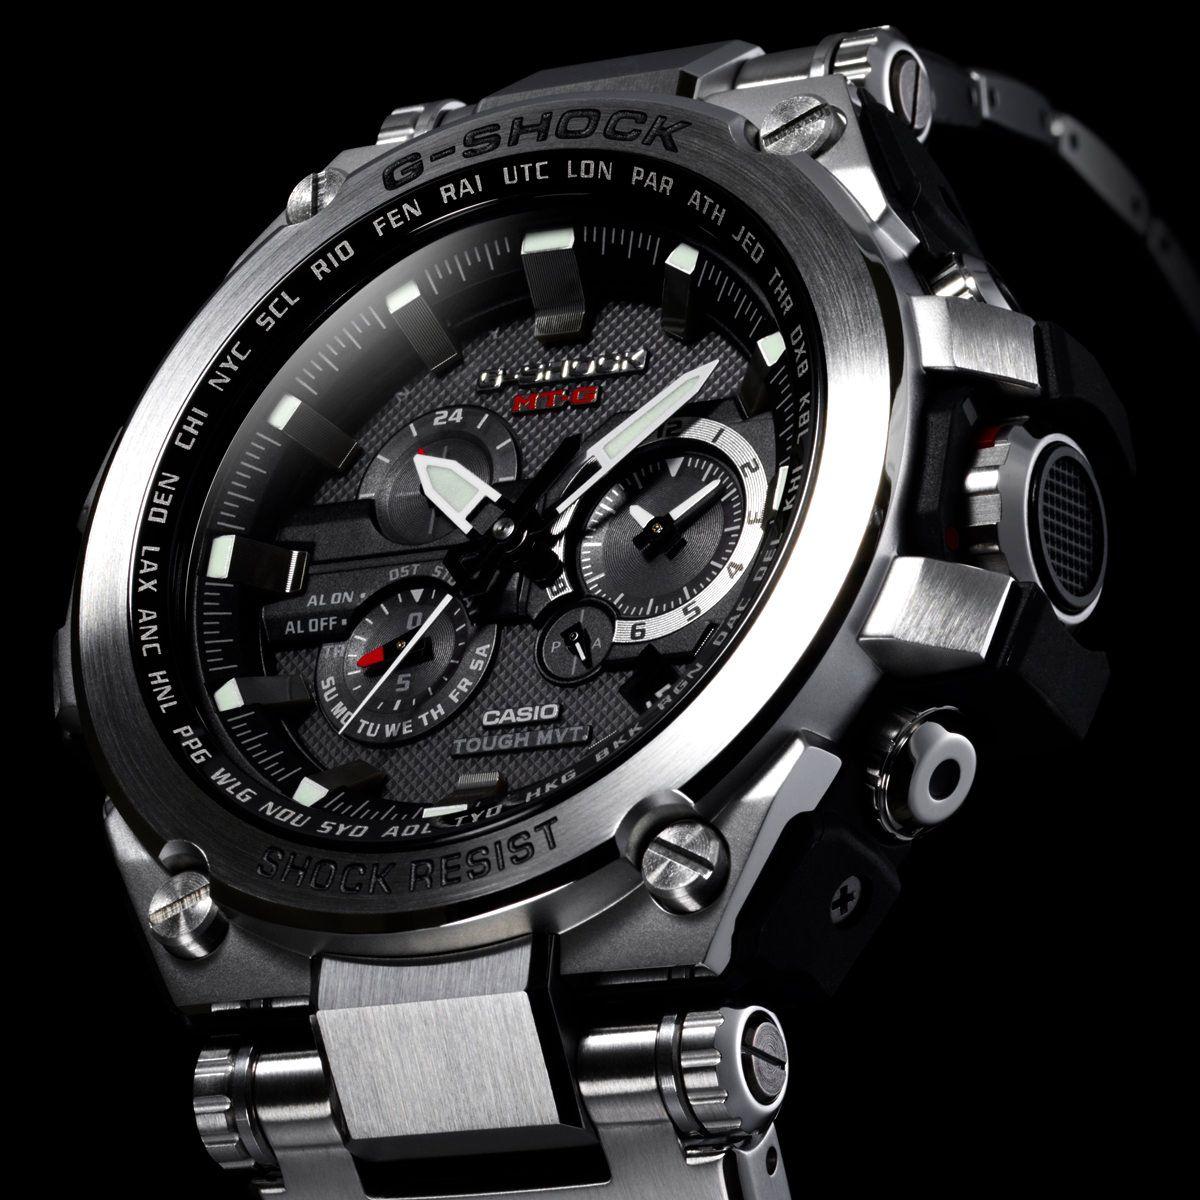 cf8e0e7b32 Casio G Shock - Top 10 Casio G-Shock Watches for Men in India